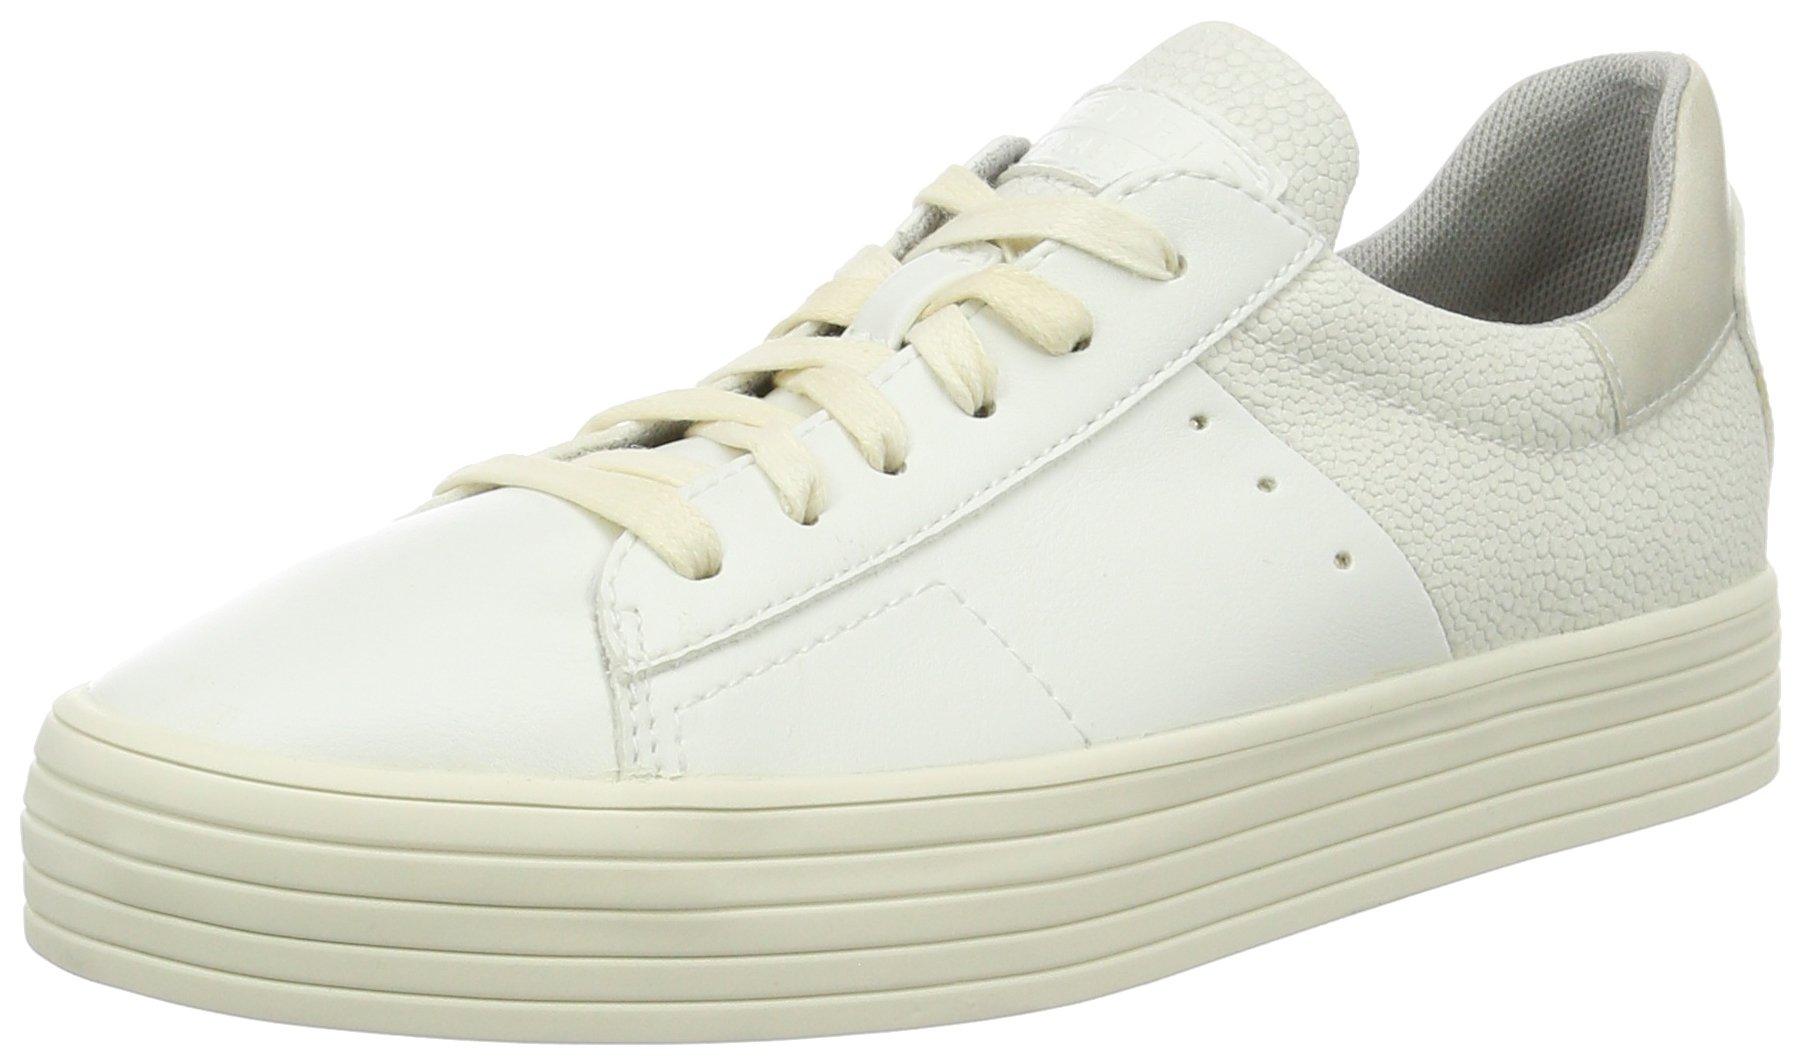 Esprit FemmeBlanc100 White39 Basses SitaSneakers Eu ChsQrdxt